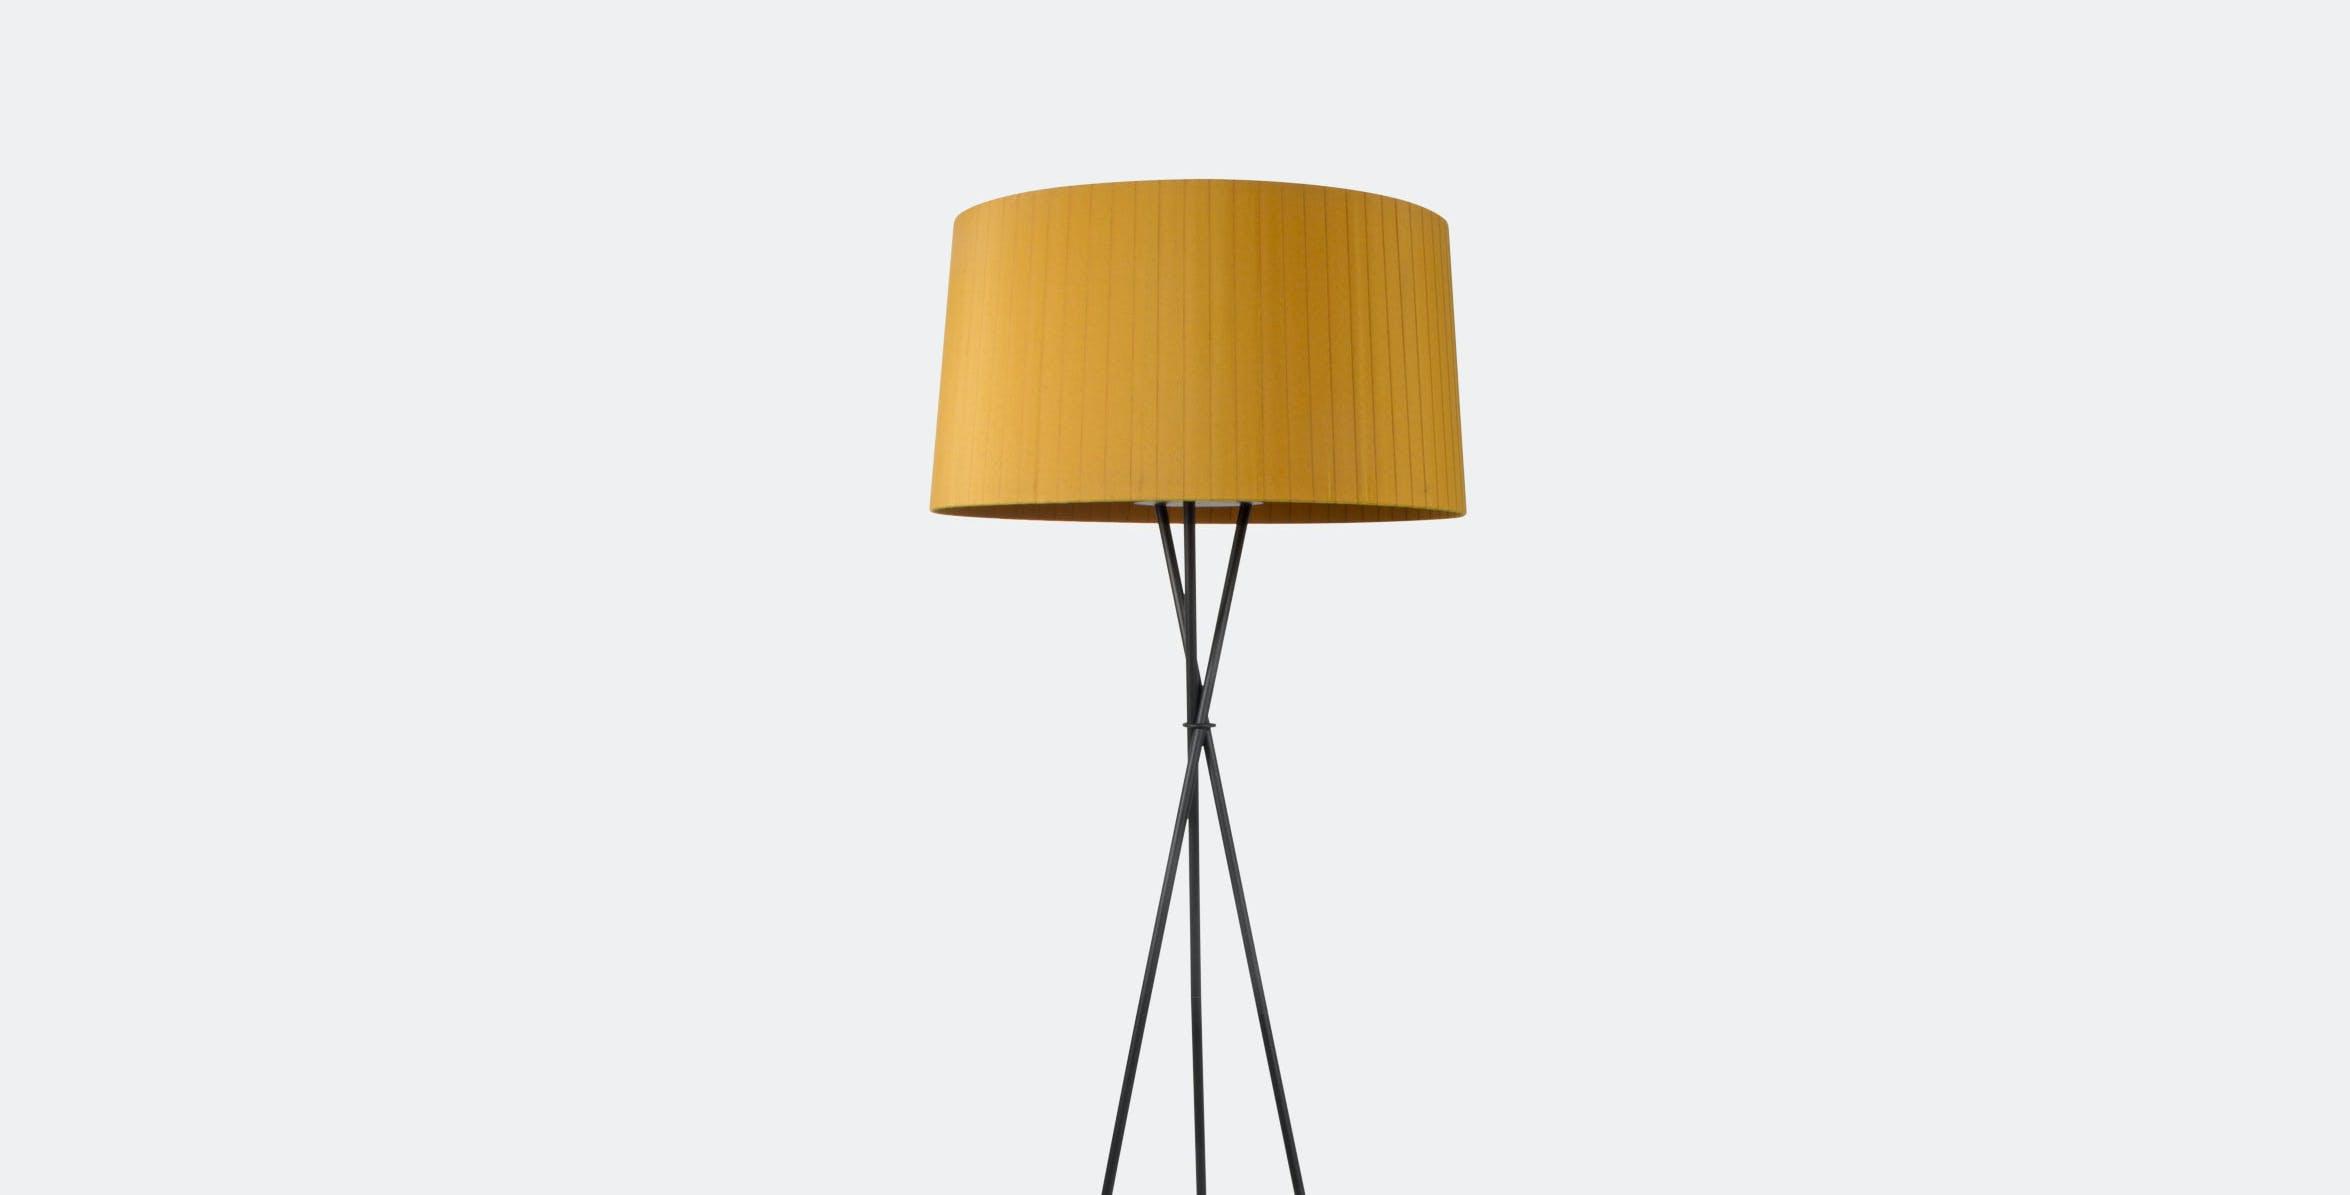 Designer Equipo Santa Cole